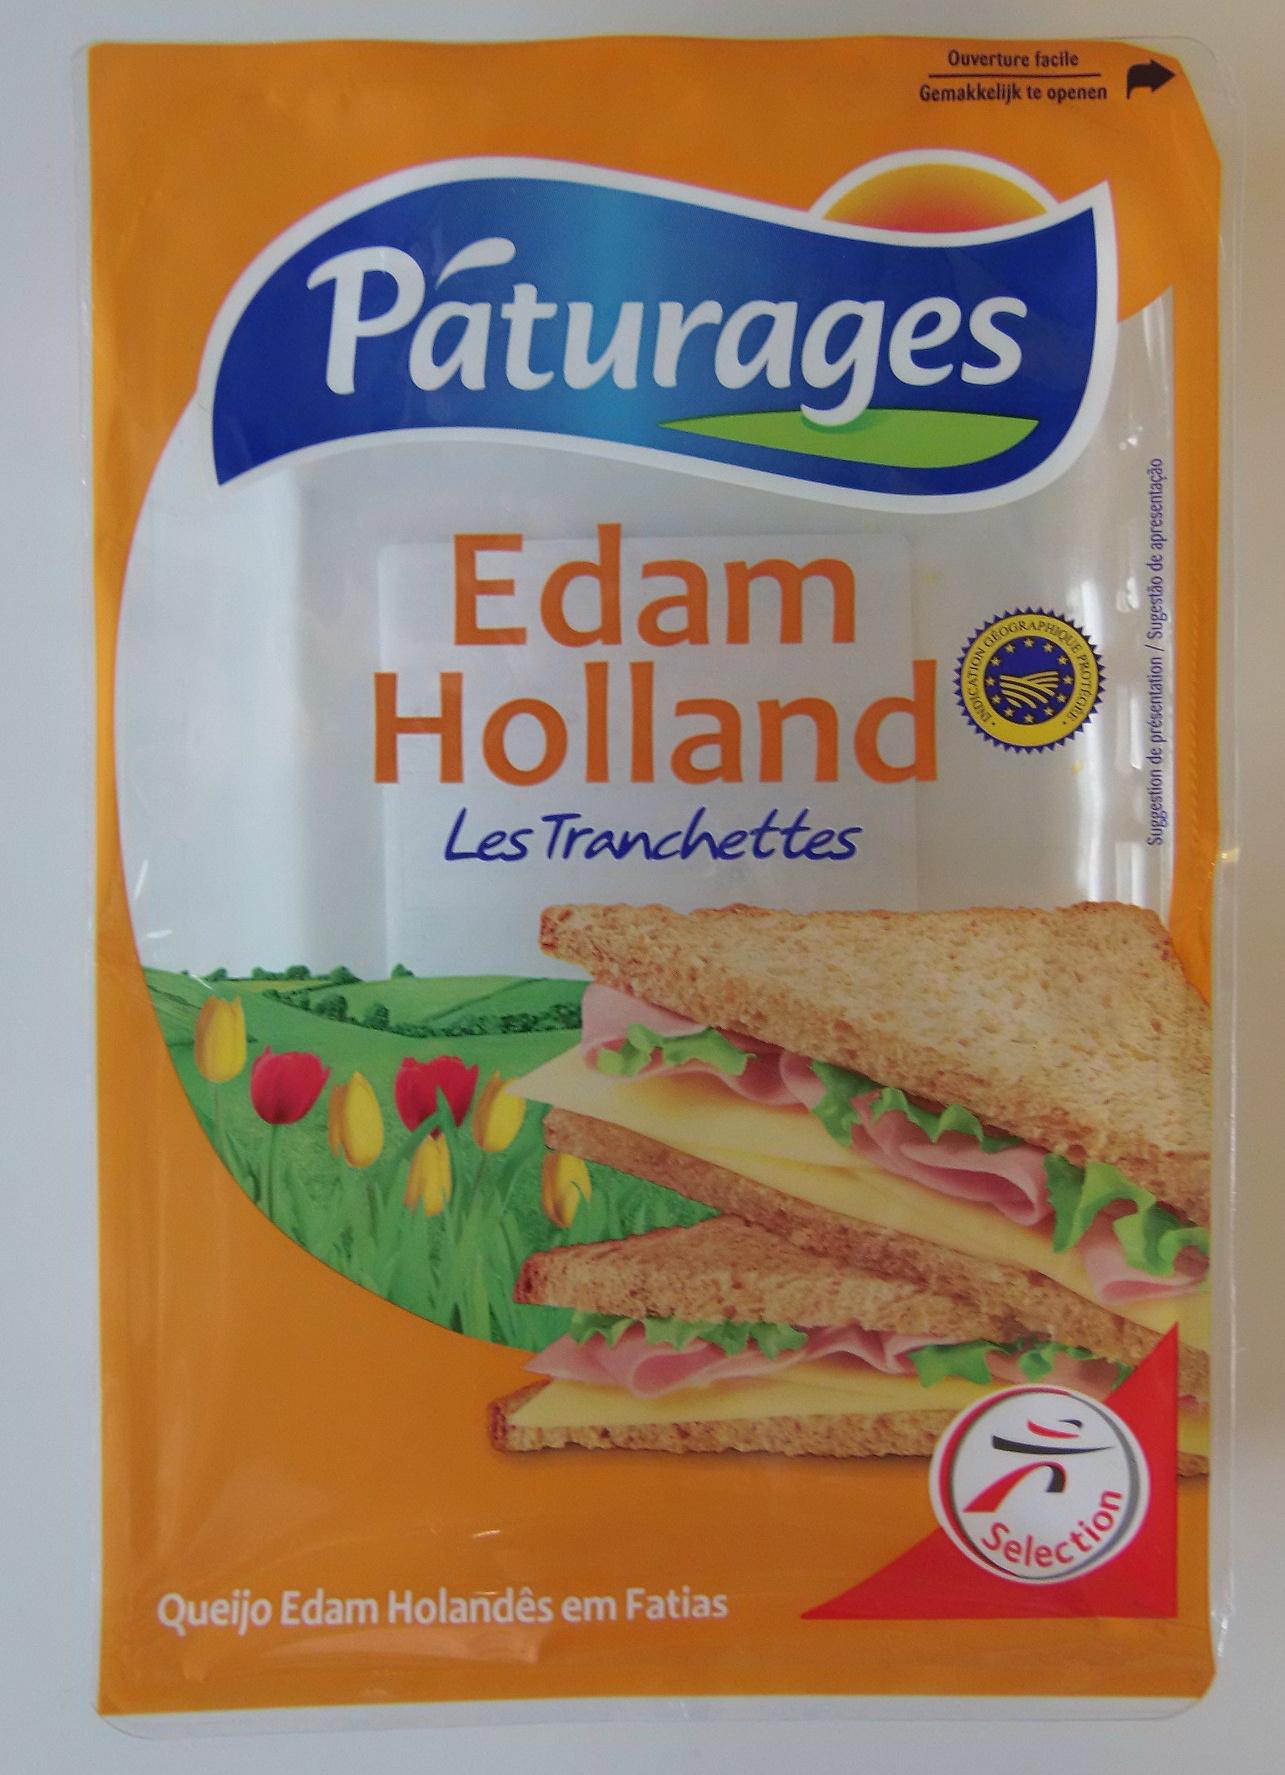 Edam Holland Les Tranchettes - Product - fr